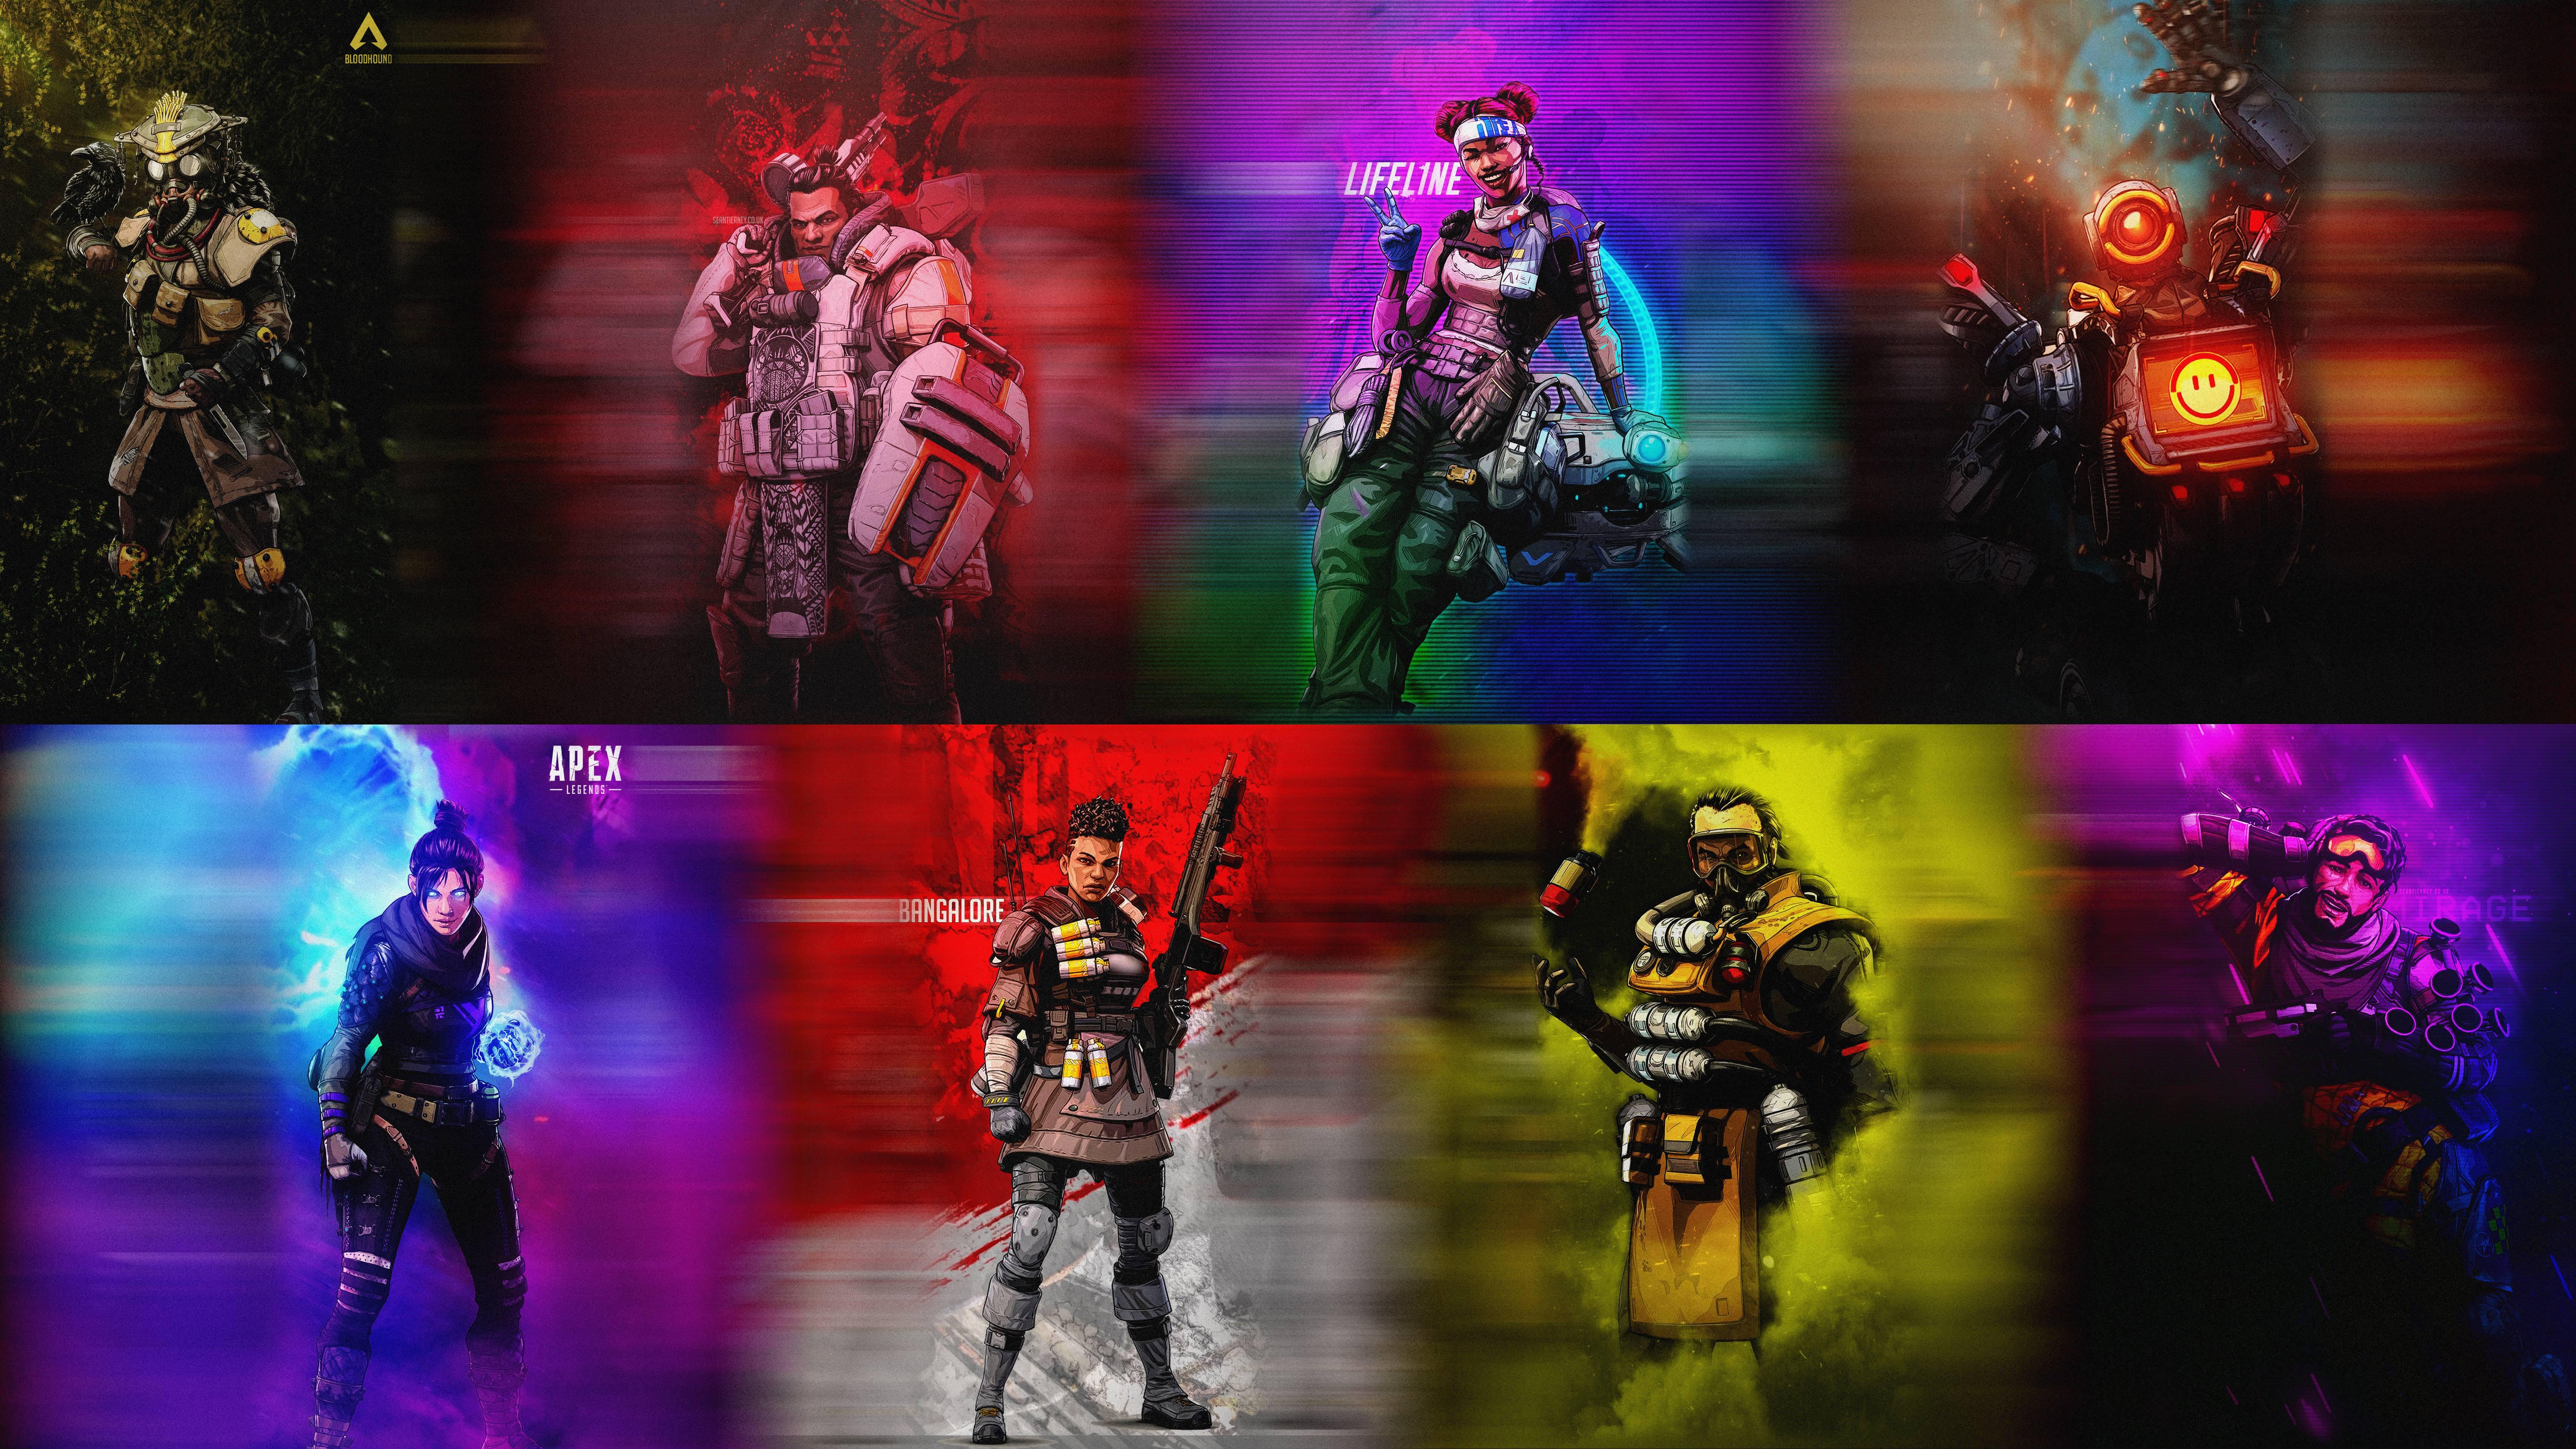 Apex Legends 5k Retina Ultra HD Wallpaper Background Image 6827x3840